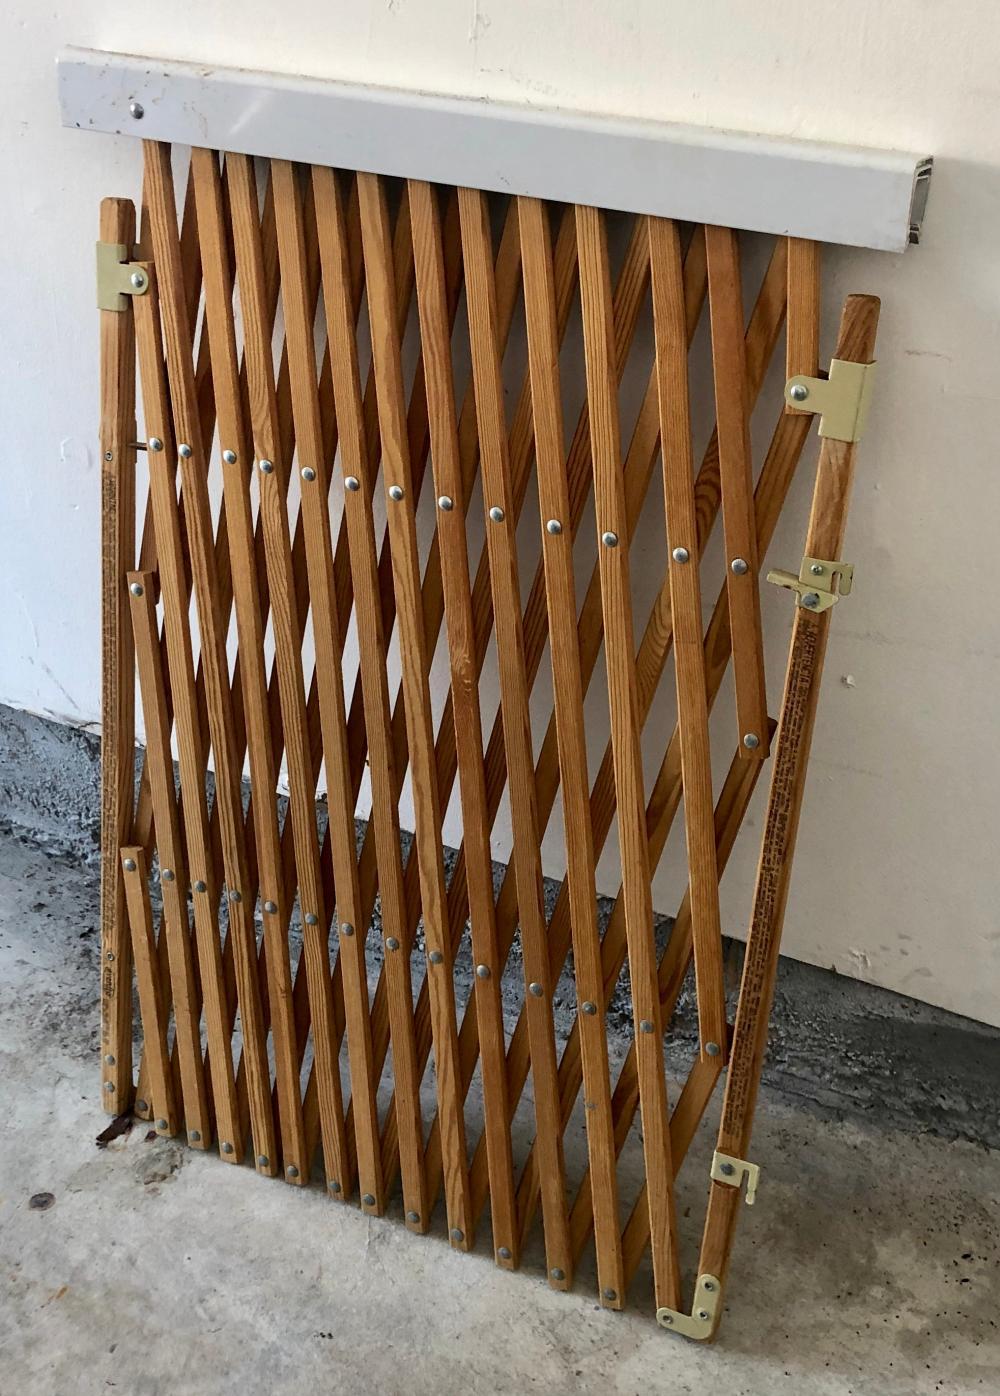 Lot 230: Wooden Gate